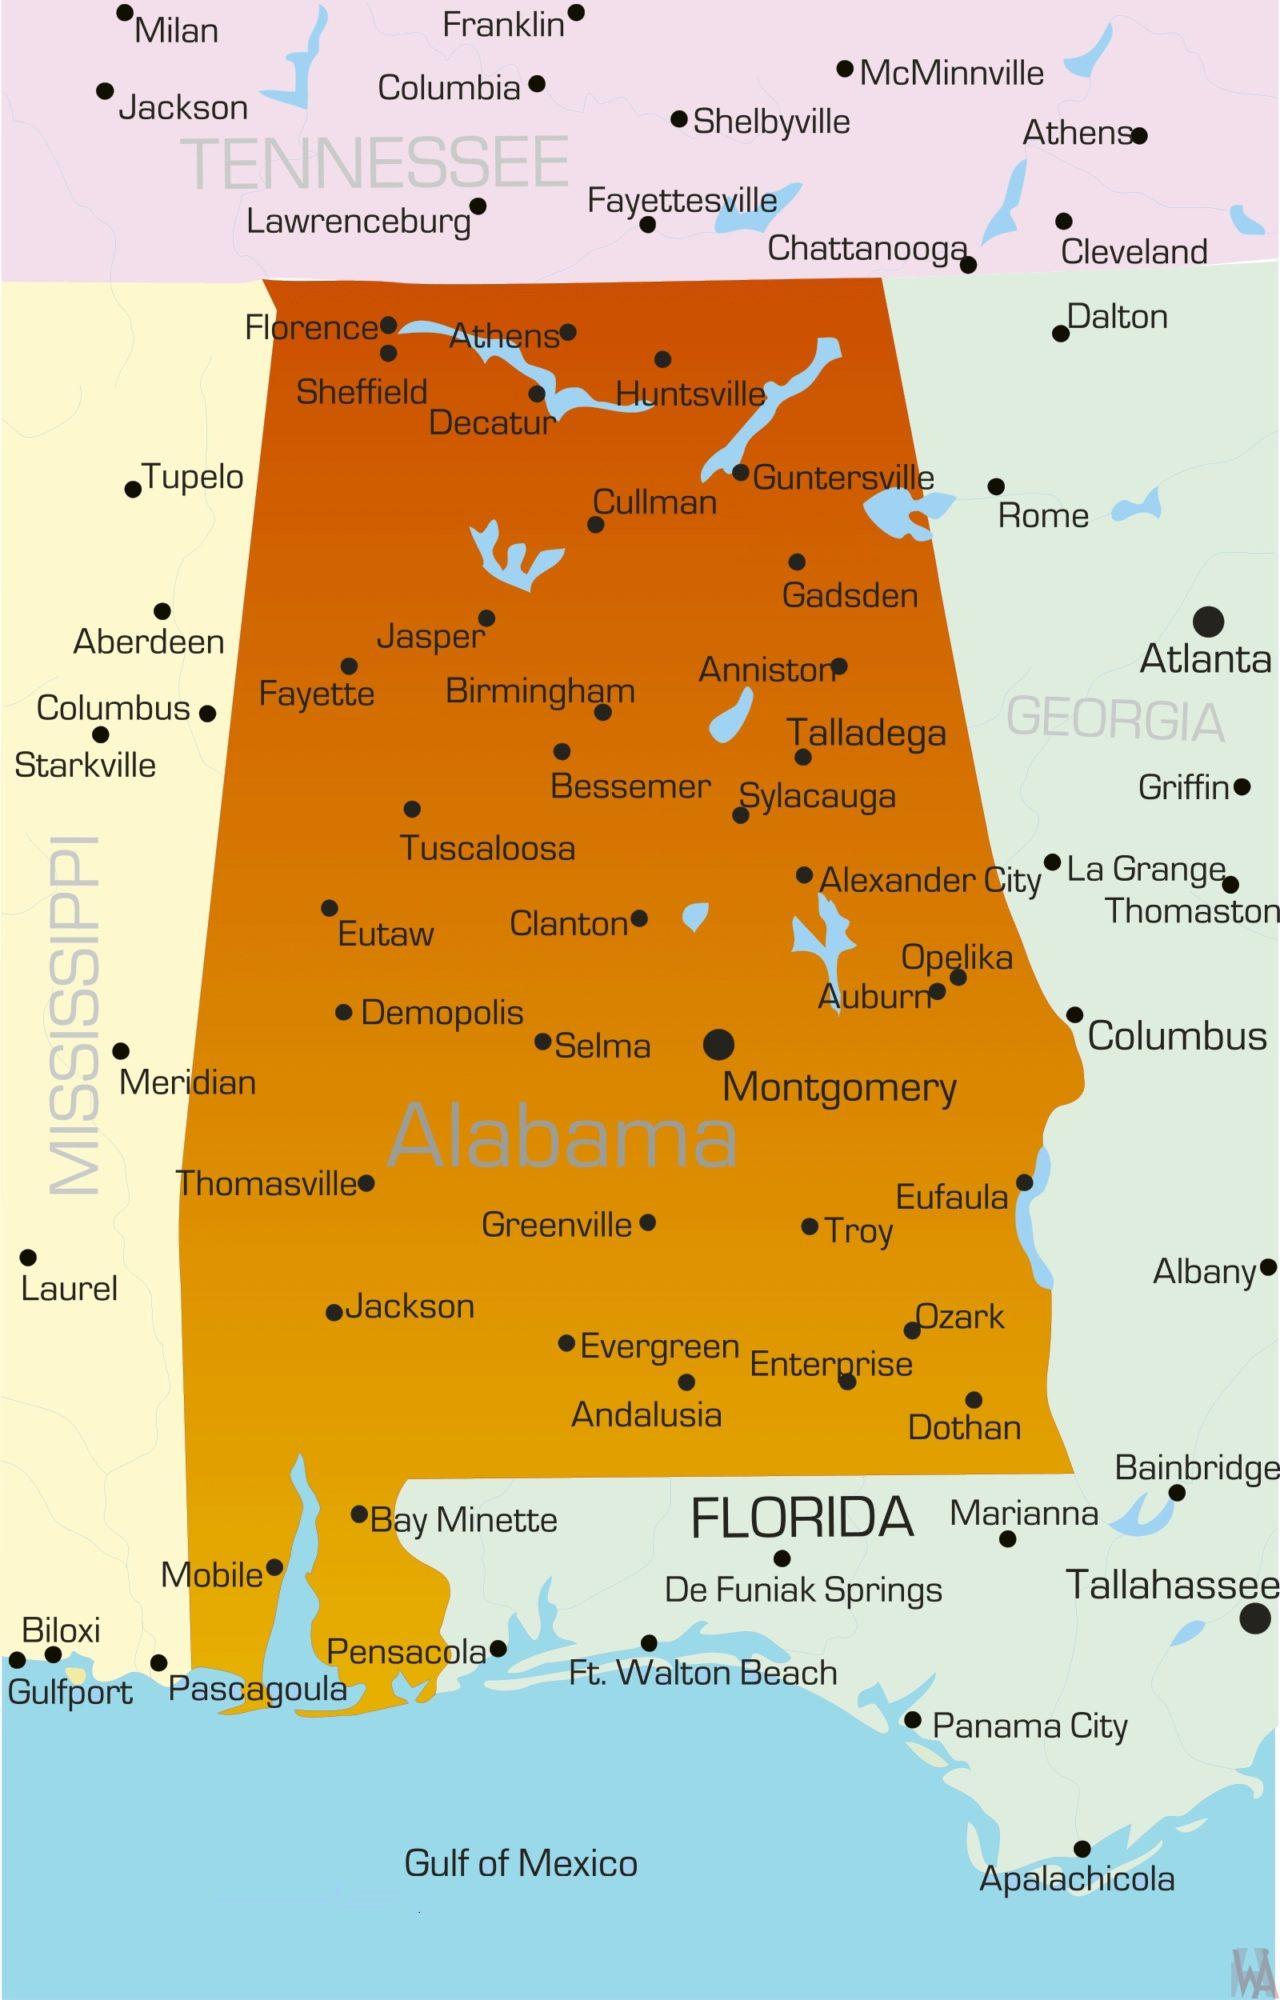 Alabama Detailed  Map |  Detailed  Map of Alabama